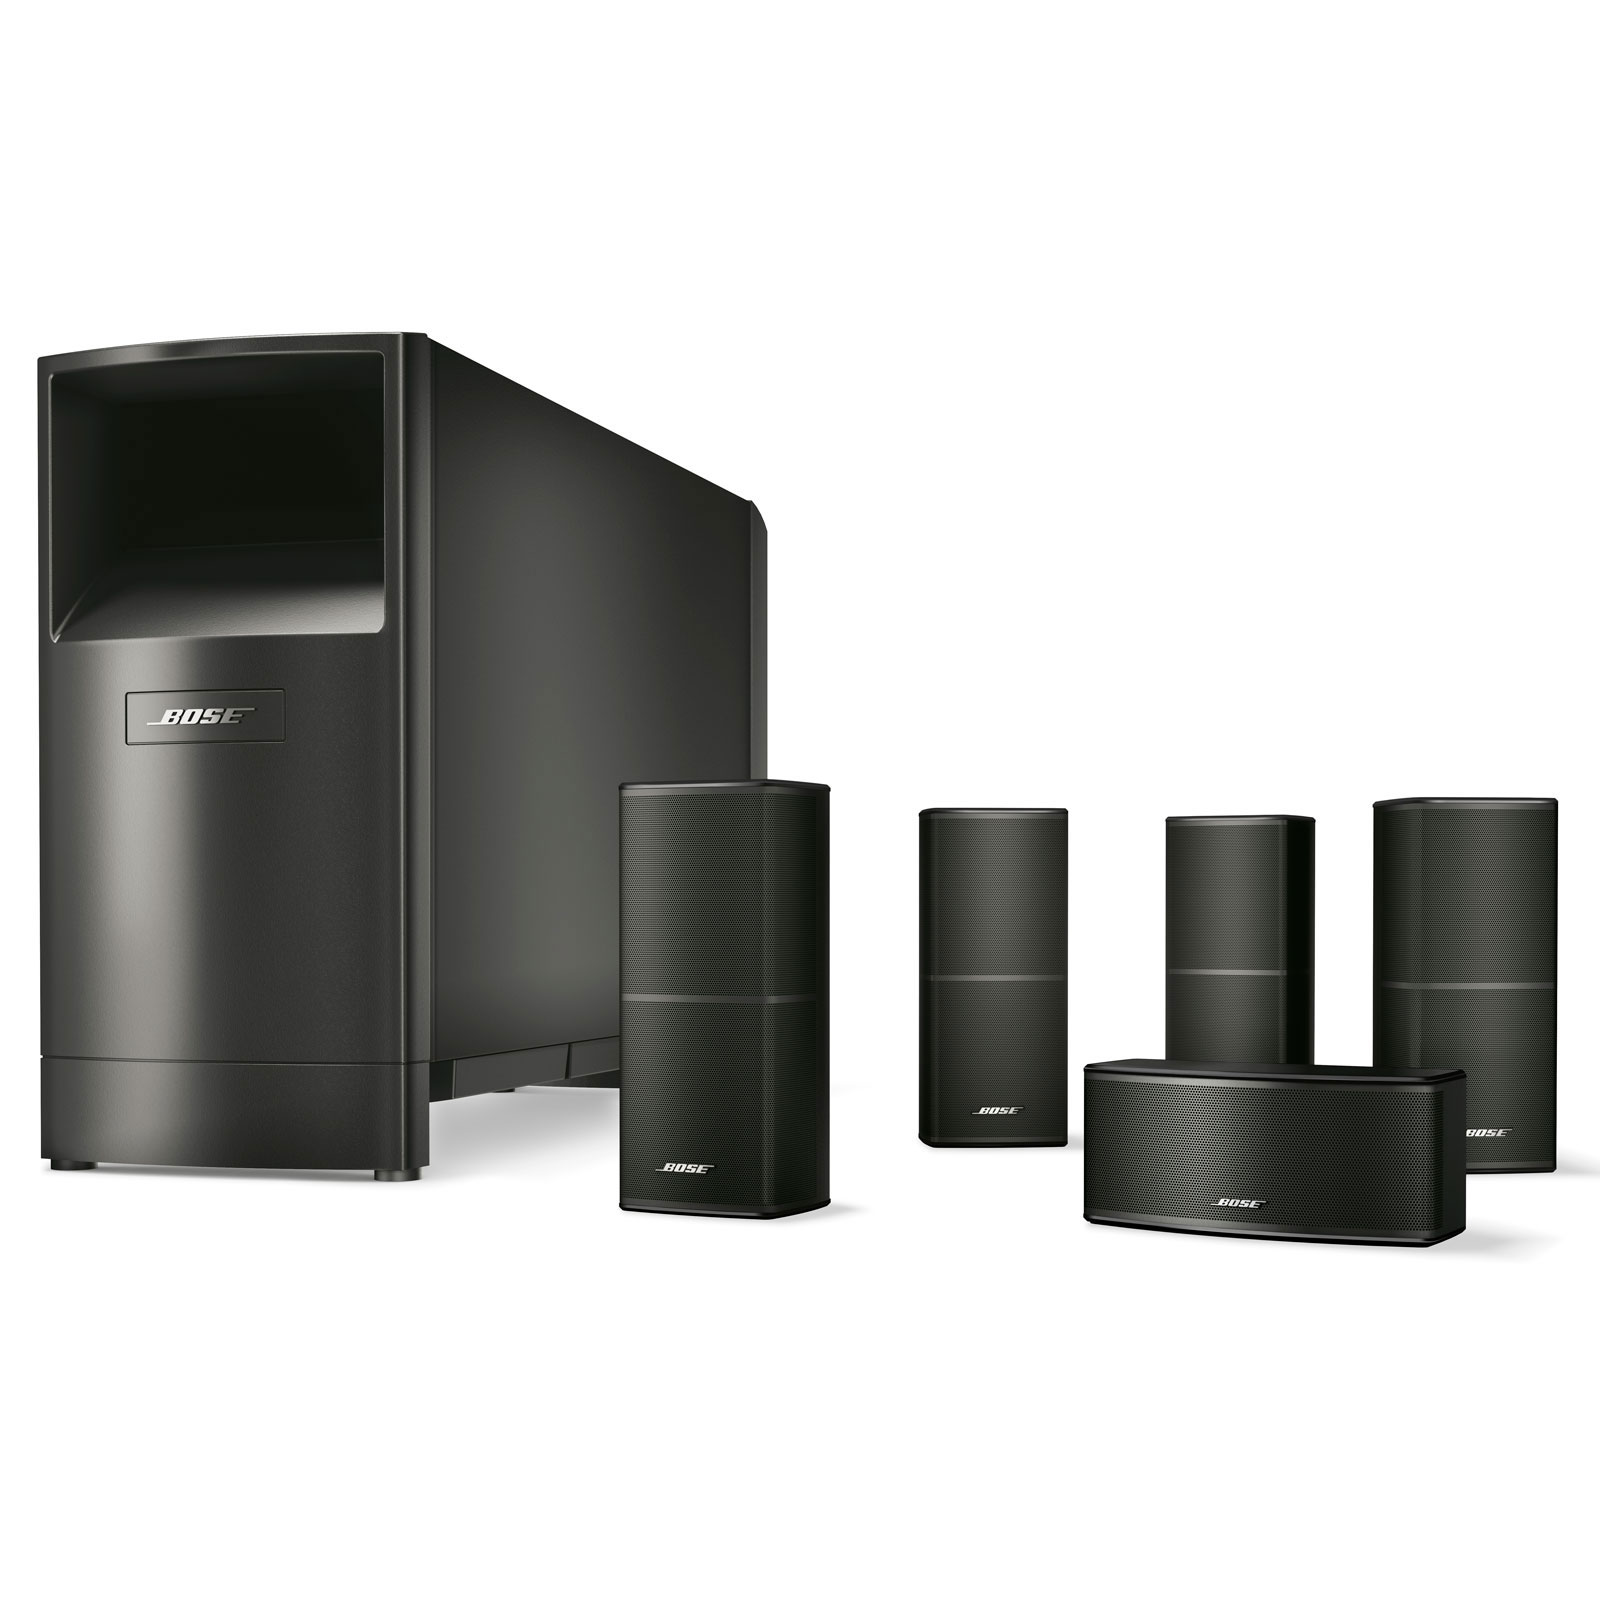 bose acoustimass 10 s ries v noir enceintes hifi bose sur. Black Bedroom Furniture Sets. Home Design Ideas